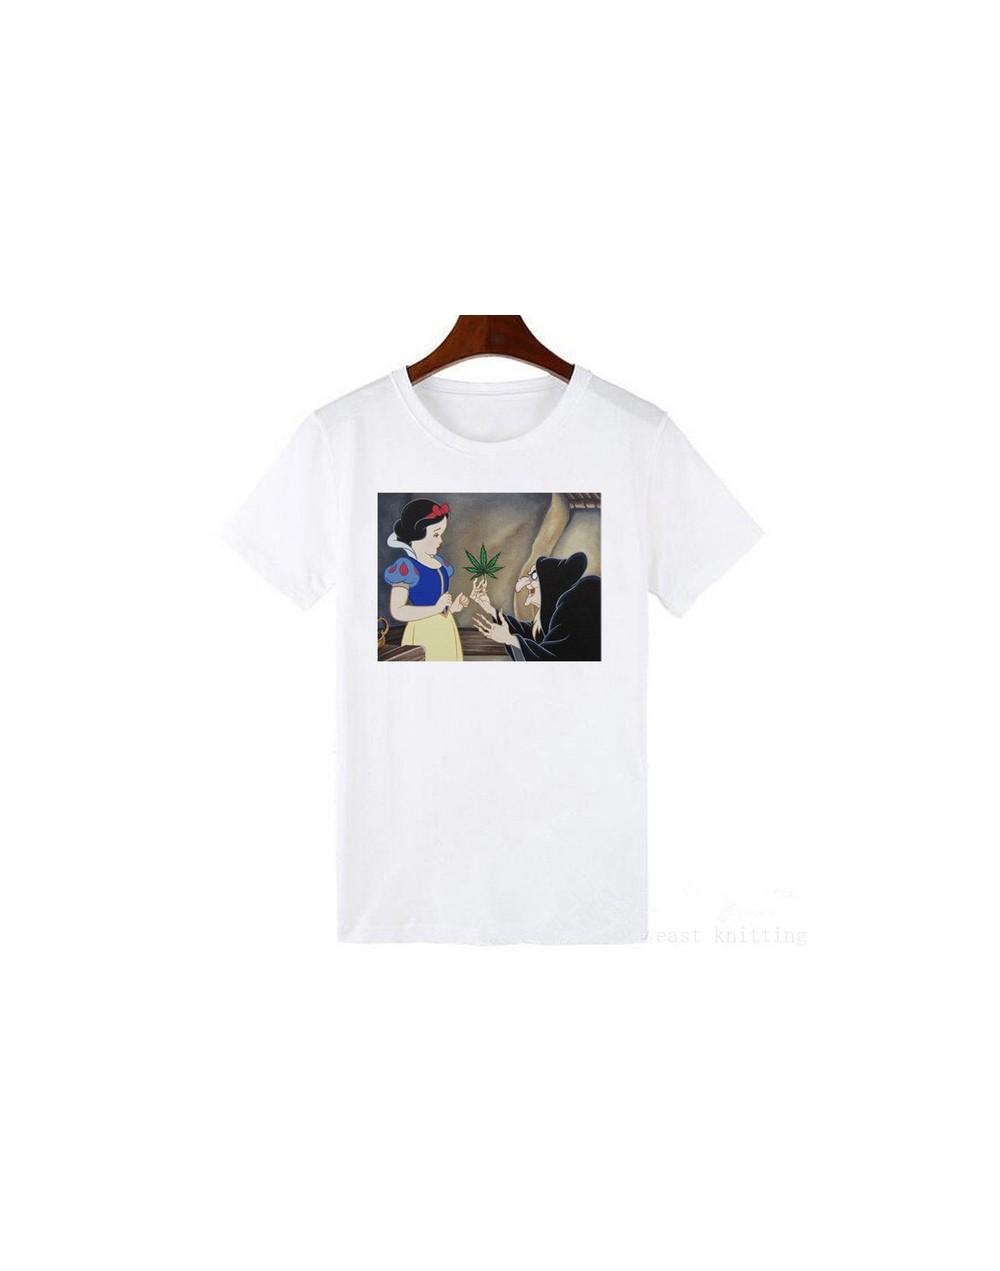 Women's Dark Snow White Harajuku T Shirt Funny Print Casual Short Sleeve Tshirt Girls Streetwear - 1035 - 4C4144489519-20